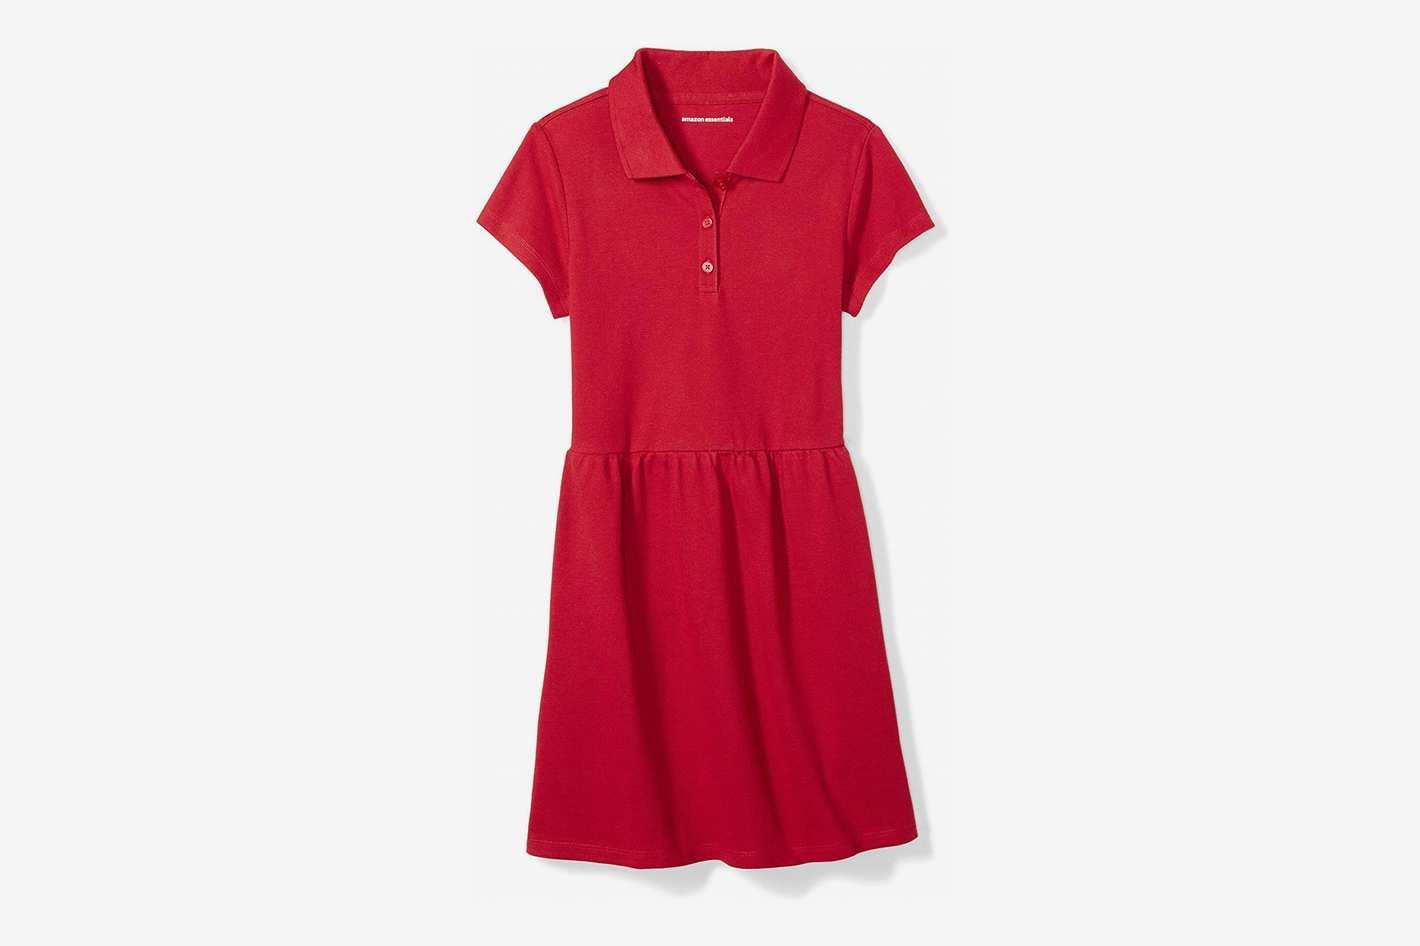 Amazon Essentials Girls' Short-Sleeve Polo Dress